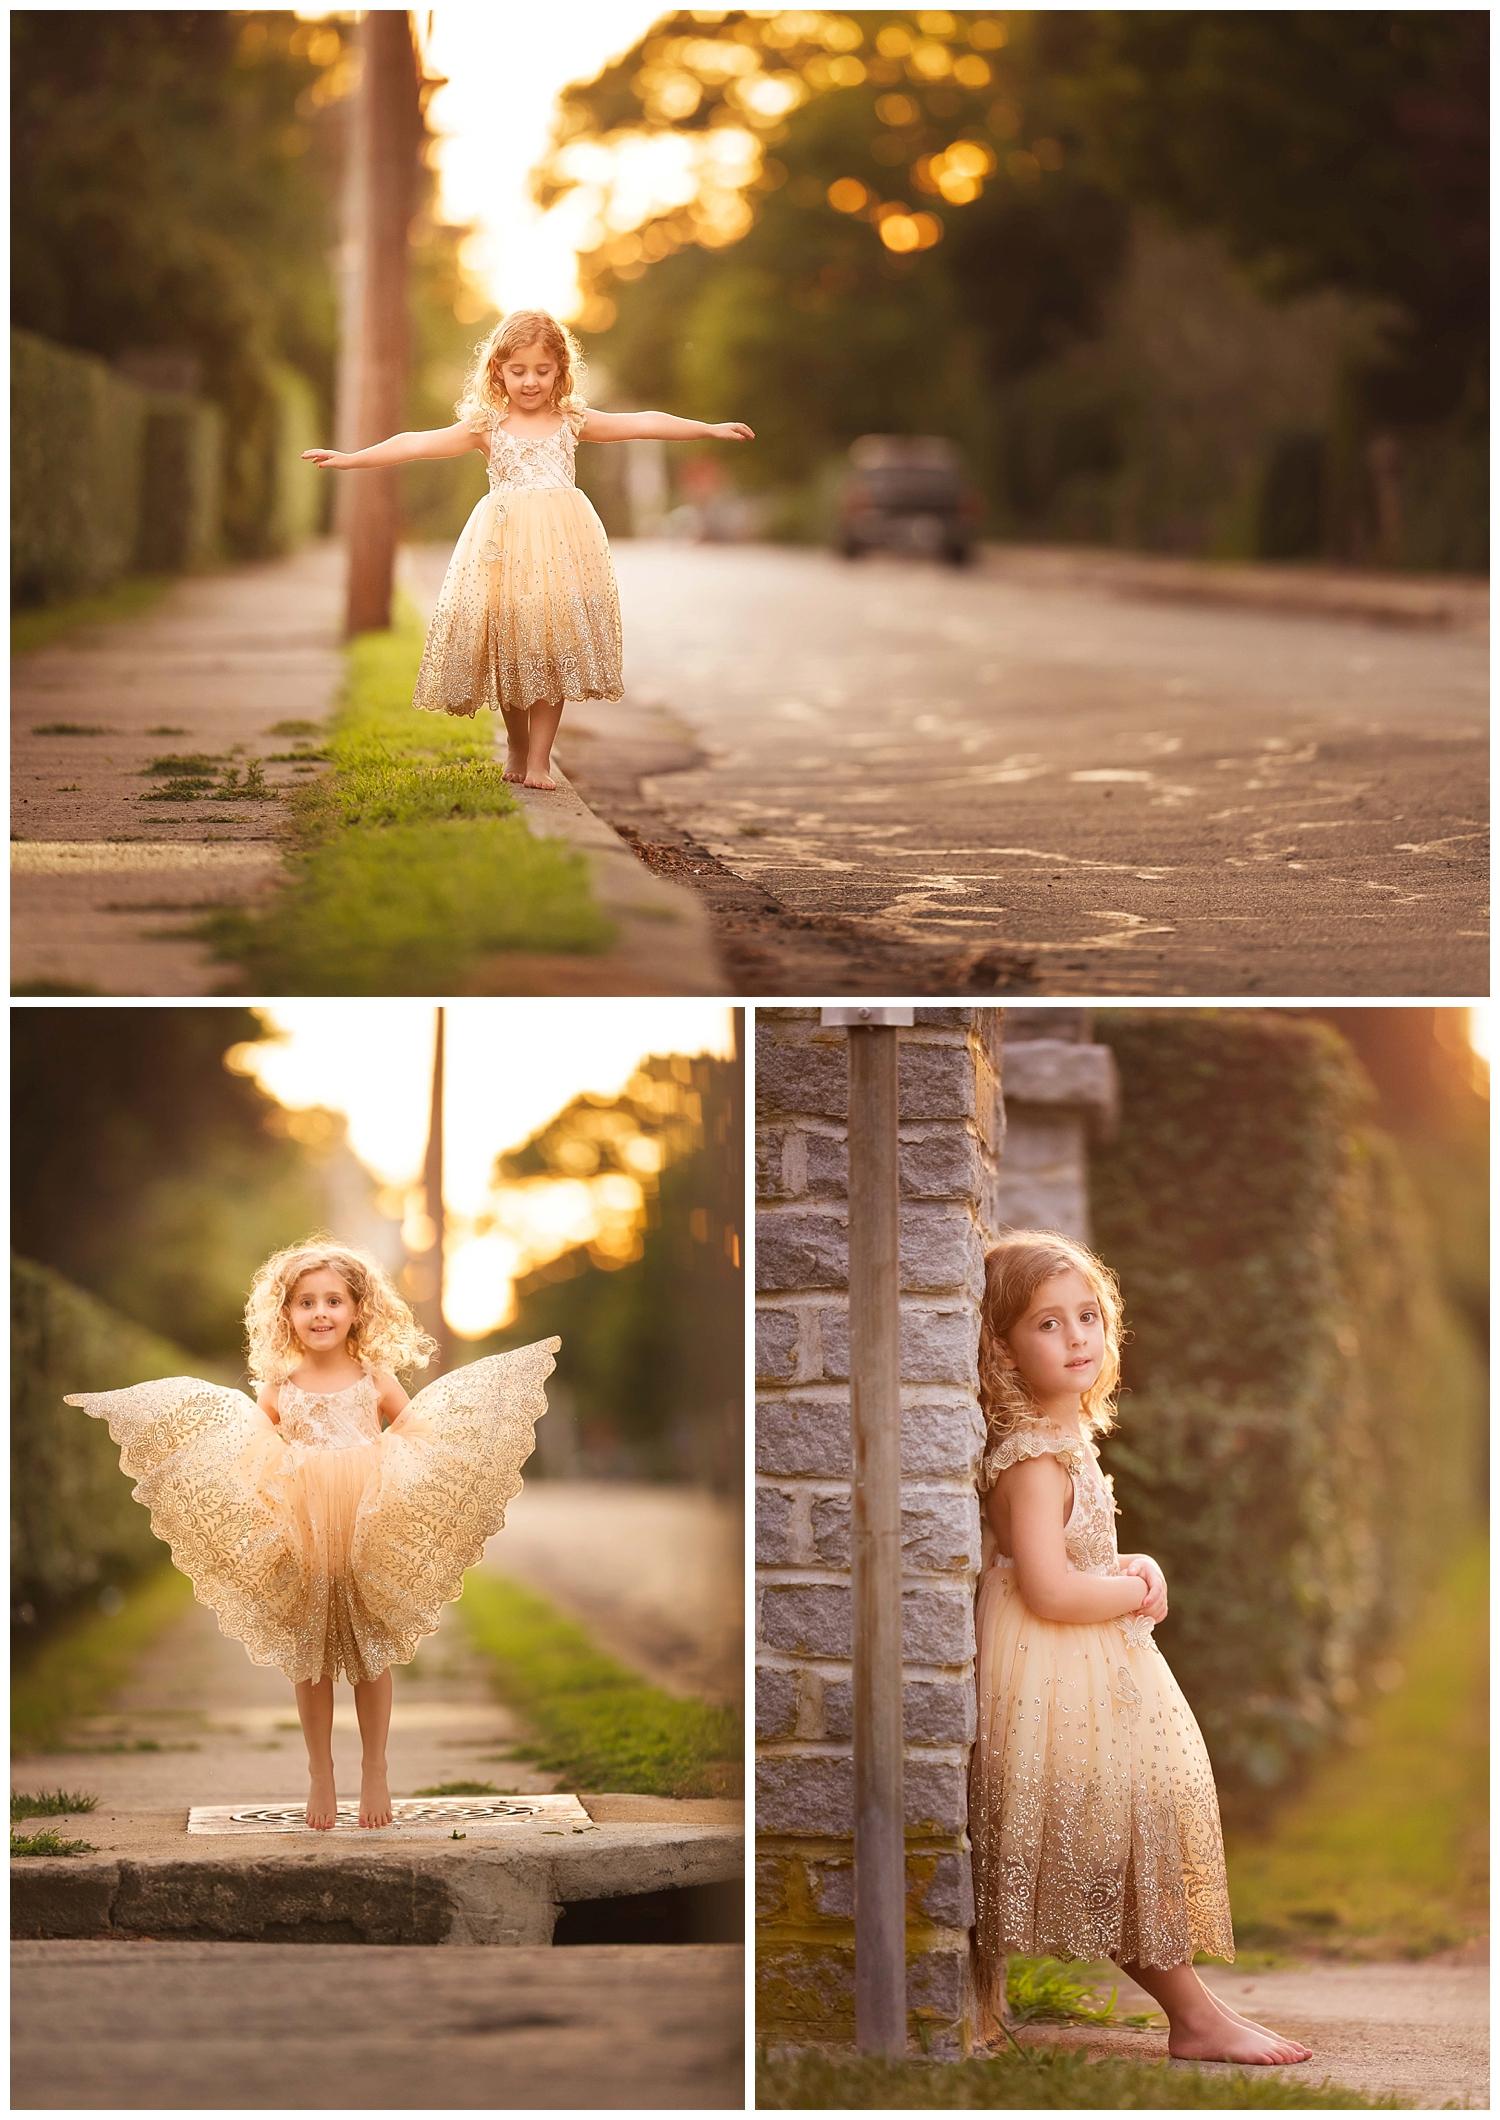 Narragansett RI children's photographer • Amy Kristin Photography • www.amykristin.com